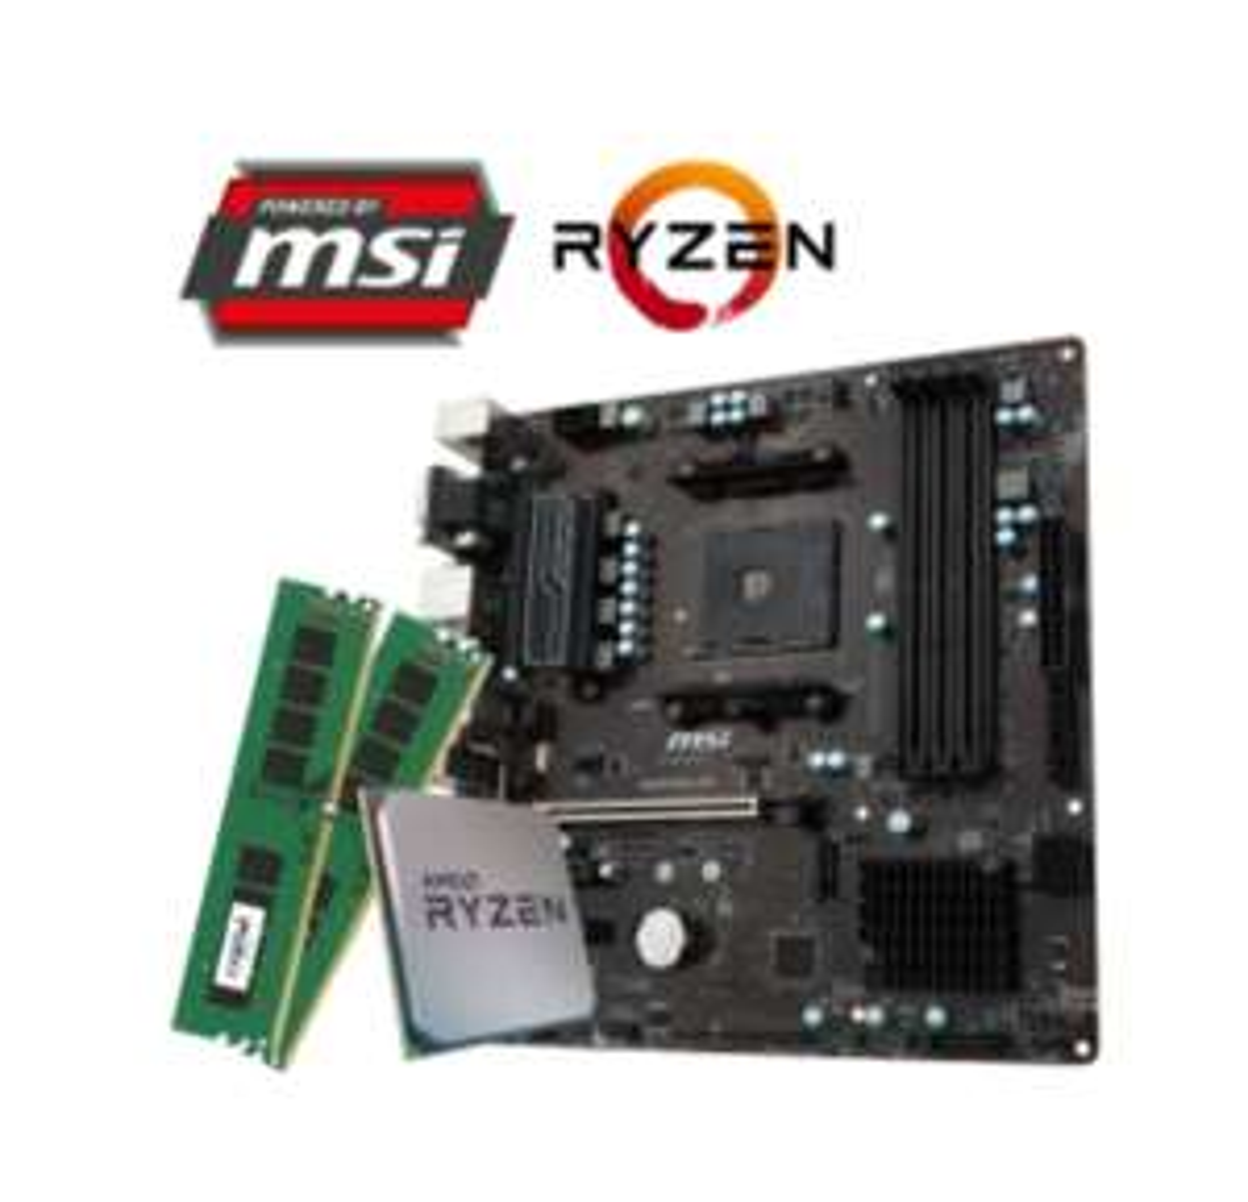 [Dubaro]Gaming PC Aufrüst Kit mit Ryzen 5 2400g, msi B350M Pro-Vdh und 8GB DDR4 Kit